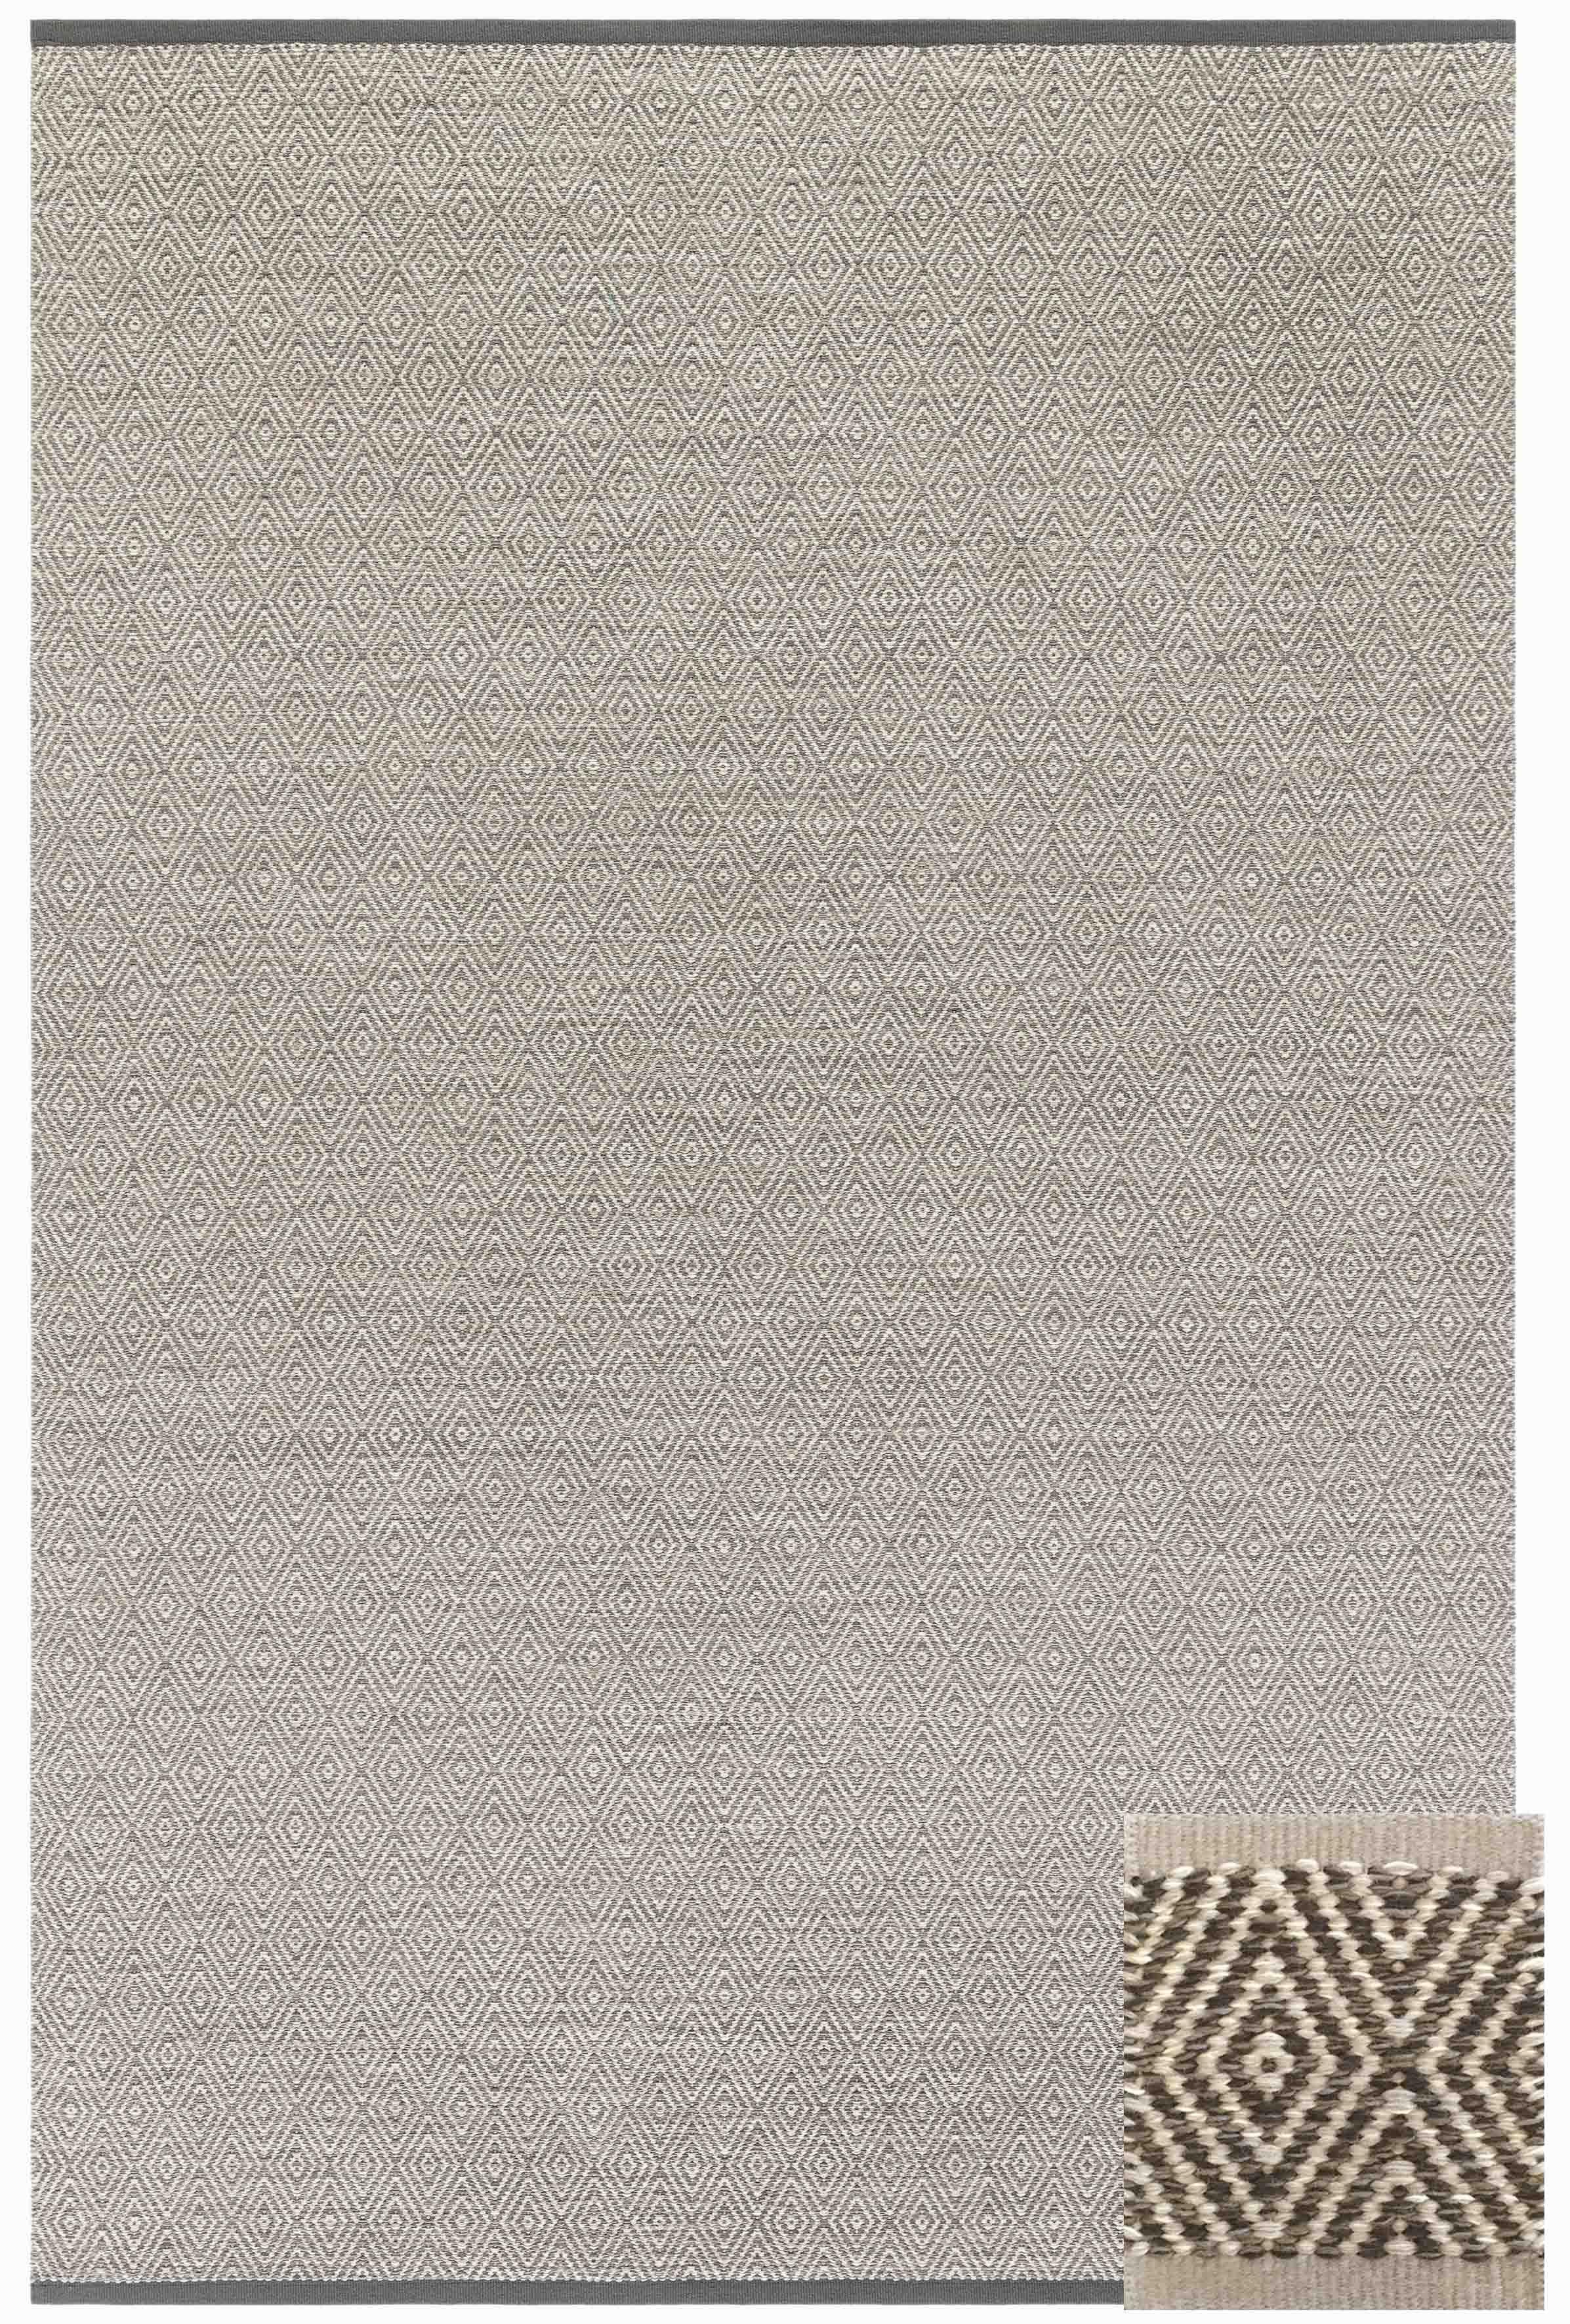 Kasthall Goose Eye Icon goose eye xl woven wool rug color: summer haze/custom brown